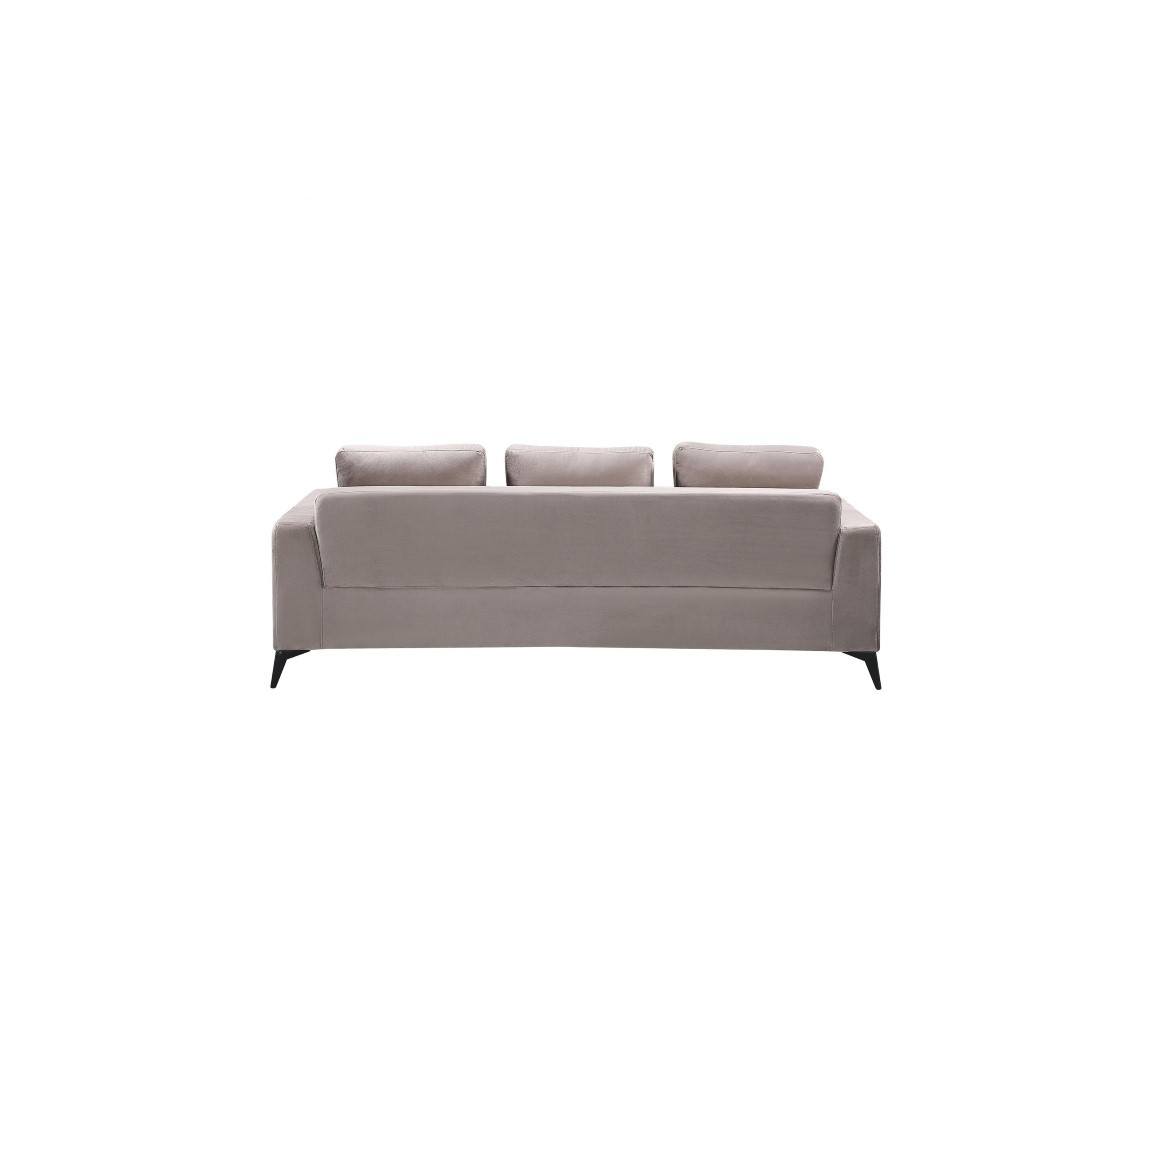 3 Seater Sofa Enjoy 933 | Champagne